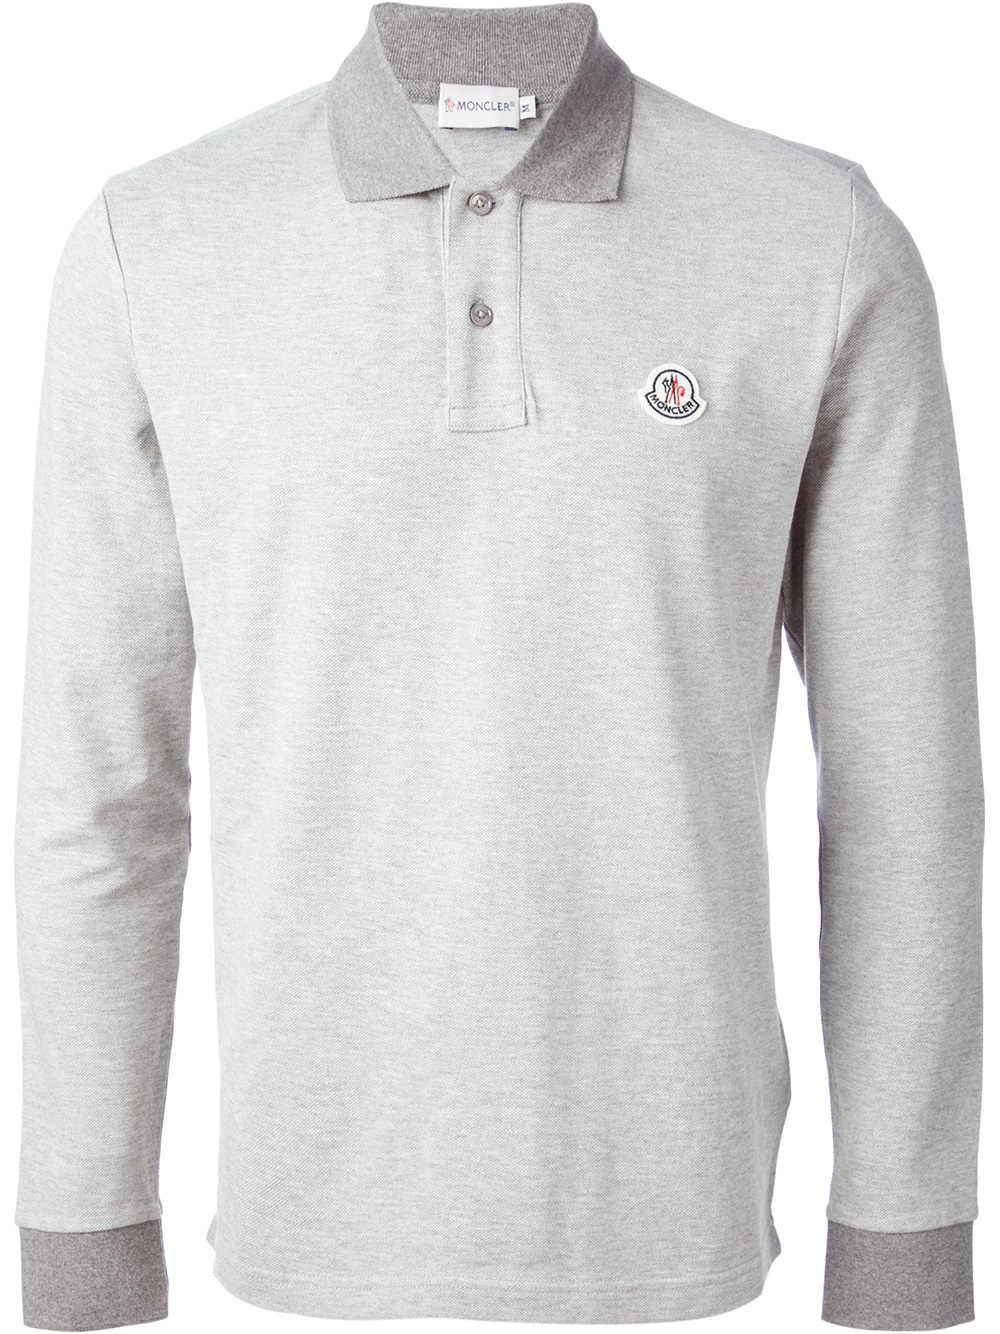 Moncler Polo Shirt Long Sleeve - BCD Tofu House 0ecdae0fab5